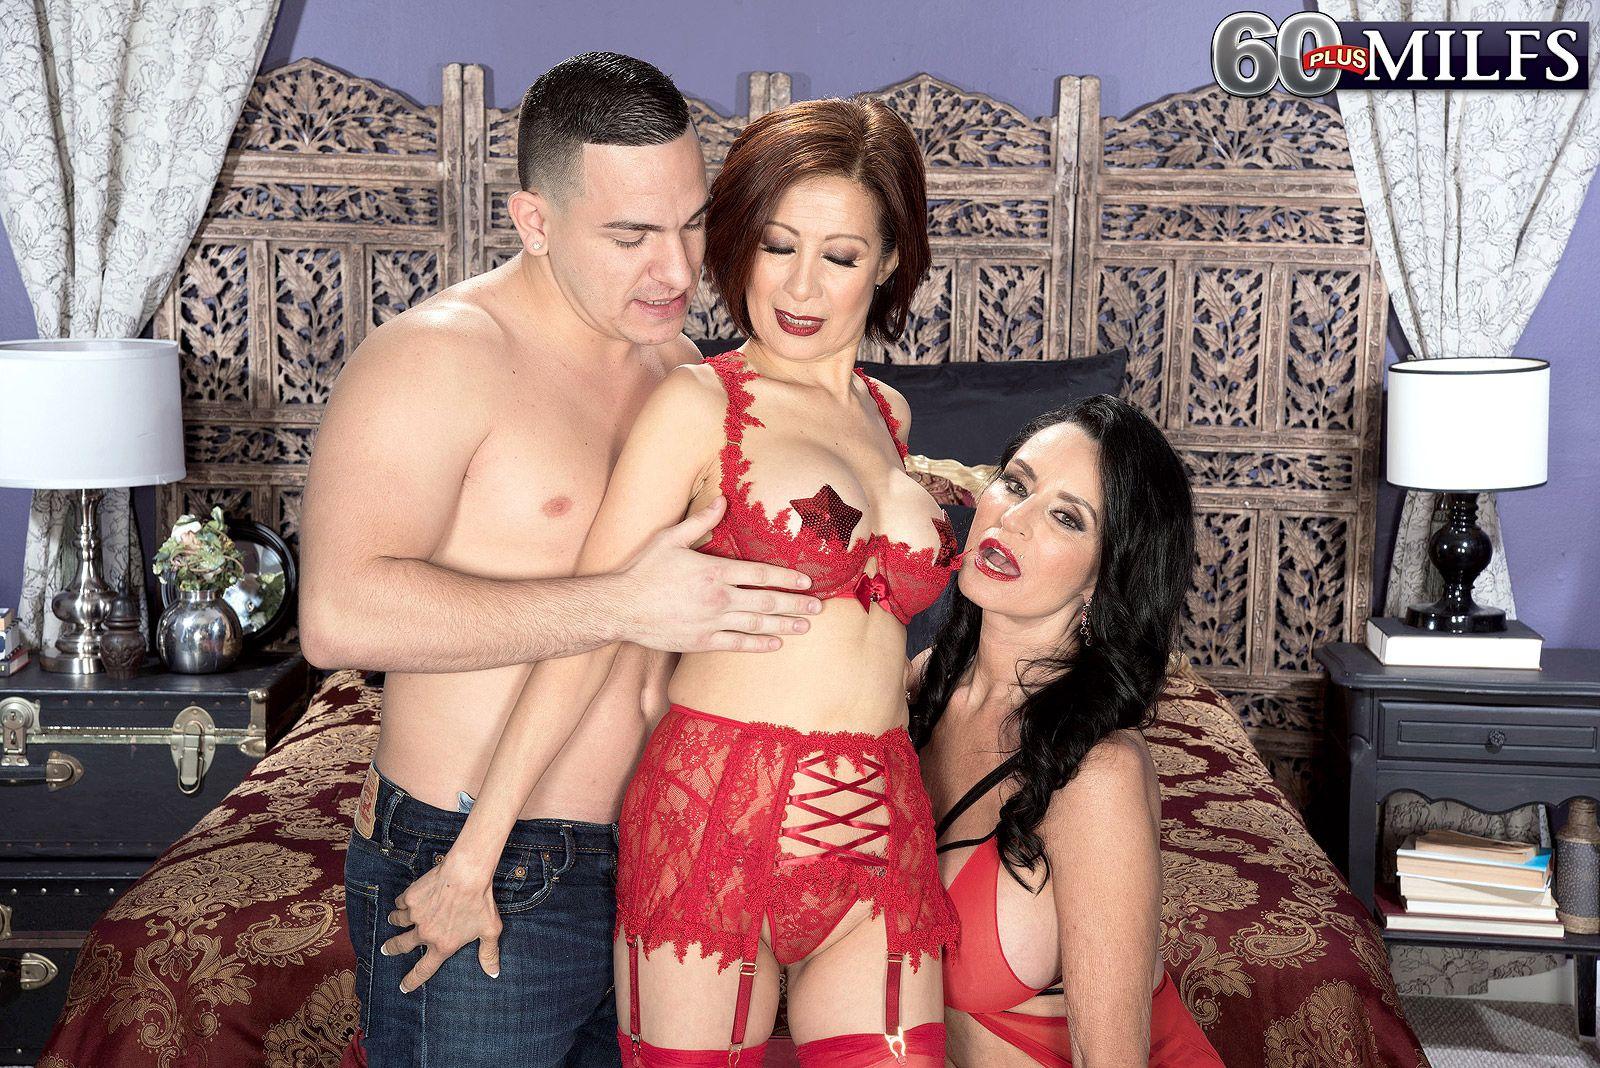 60 plus pornstars Rita Daniels and Kim Anh have a softcore threesome in lingerie